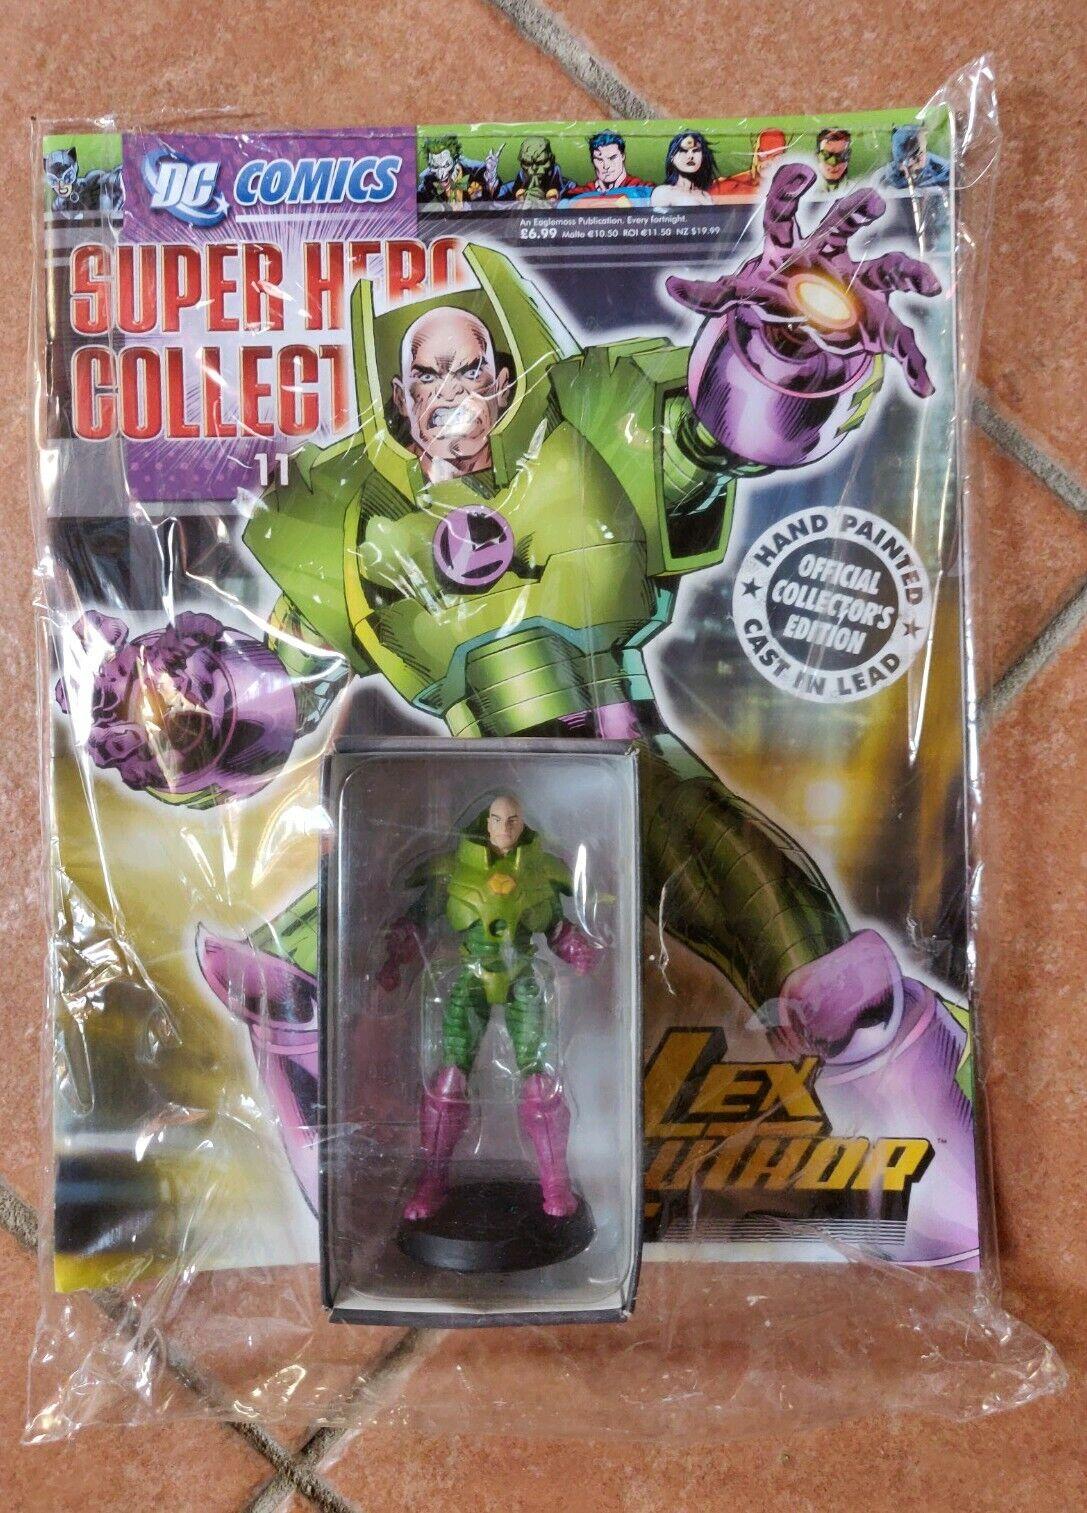 DC COMICS SUPER HERO COLLECTION SIGILLATO 11  LEX LUTHORVER INGLESE EAGLEMOSS  esclusivo